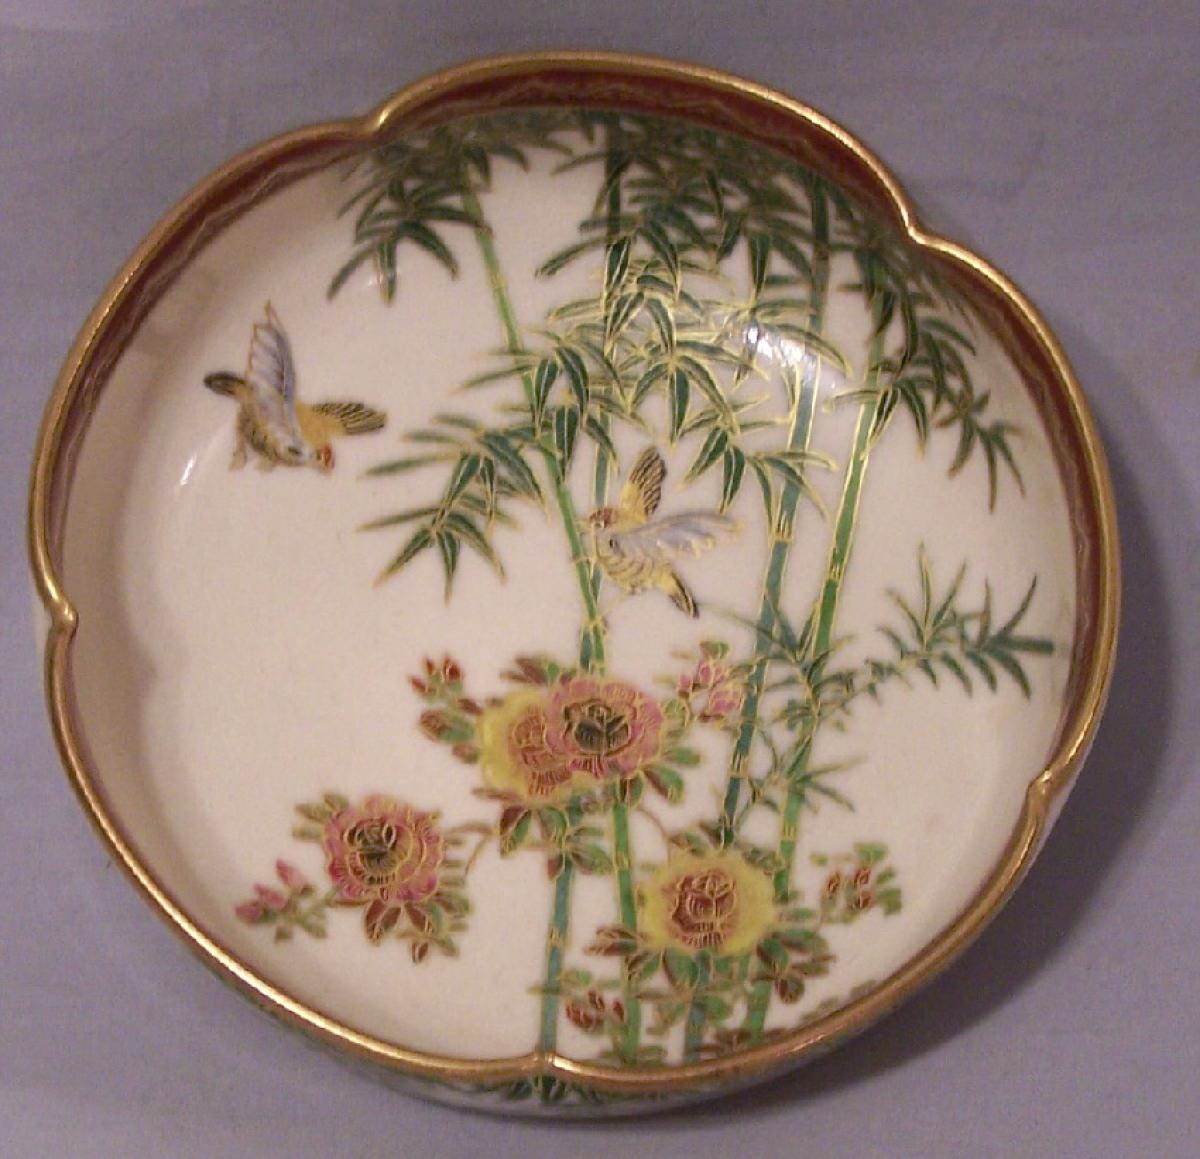 Japanese Satsuma bowl depicting flower and birds